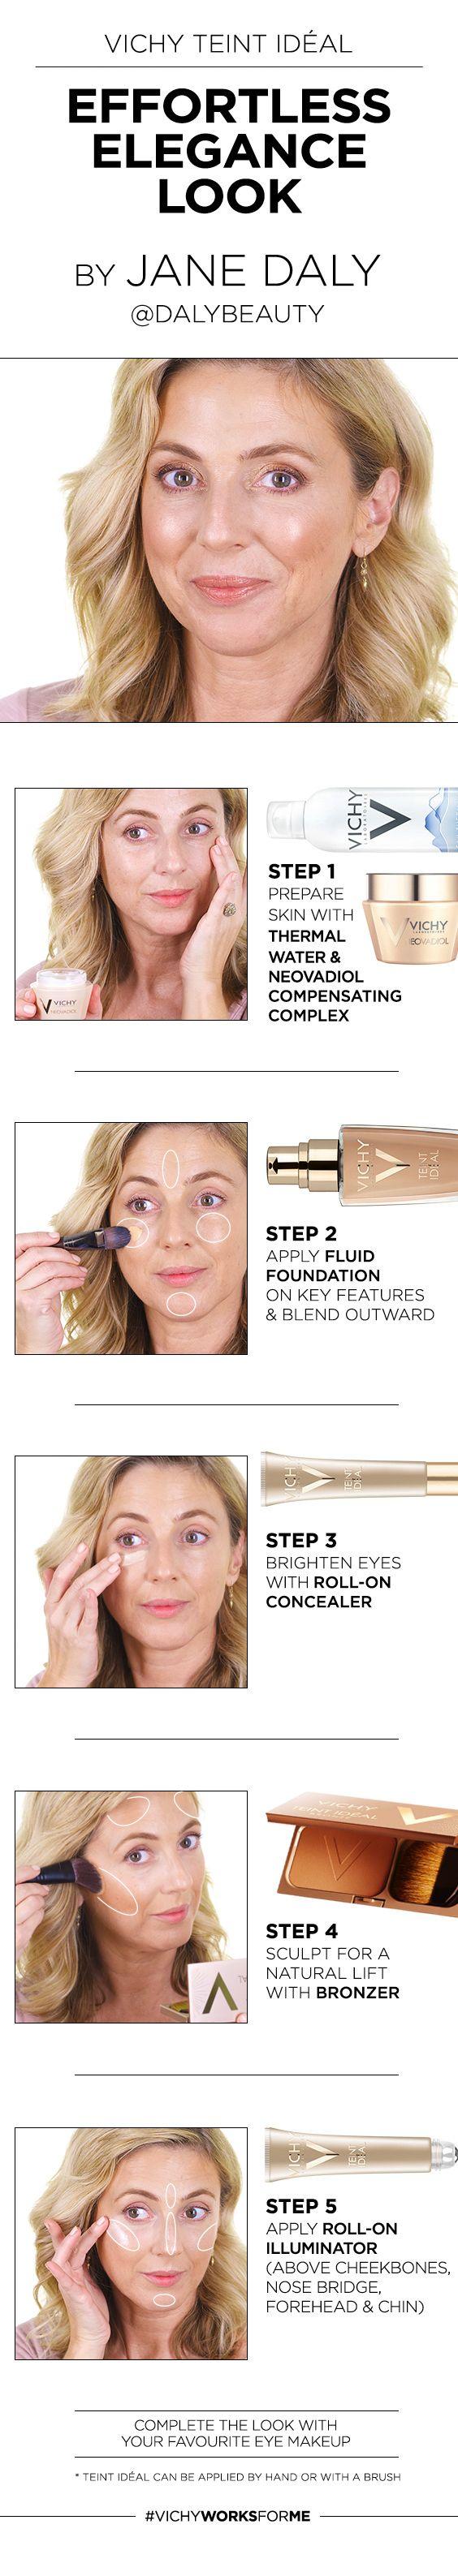 Find your Teint Idéal: http://www.vichy.ca/en/makeup-teint-ideal-info